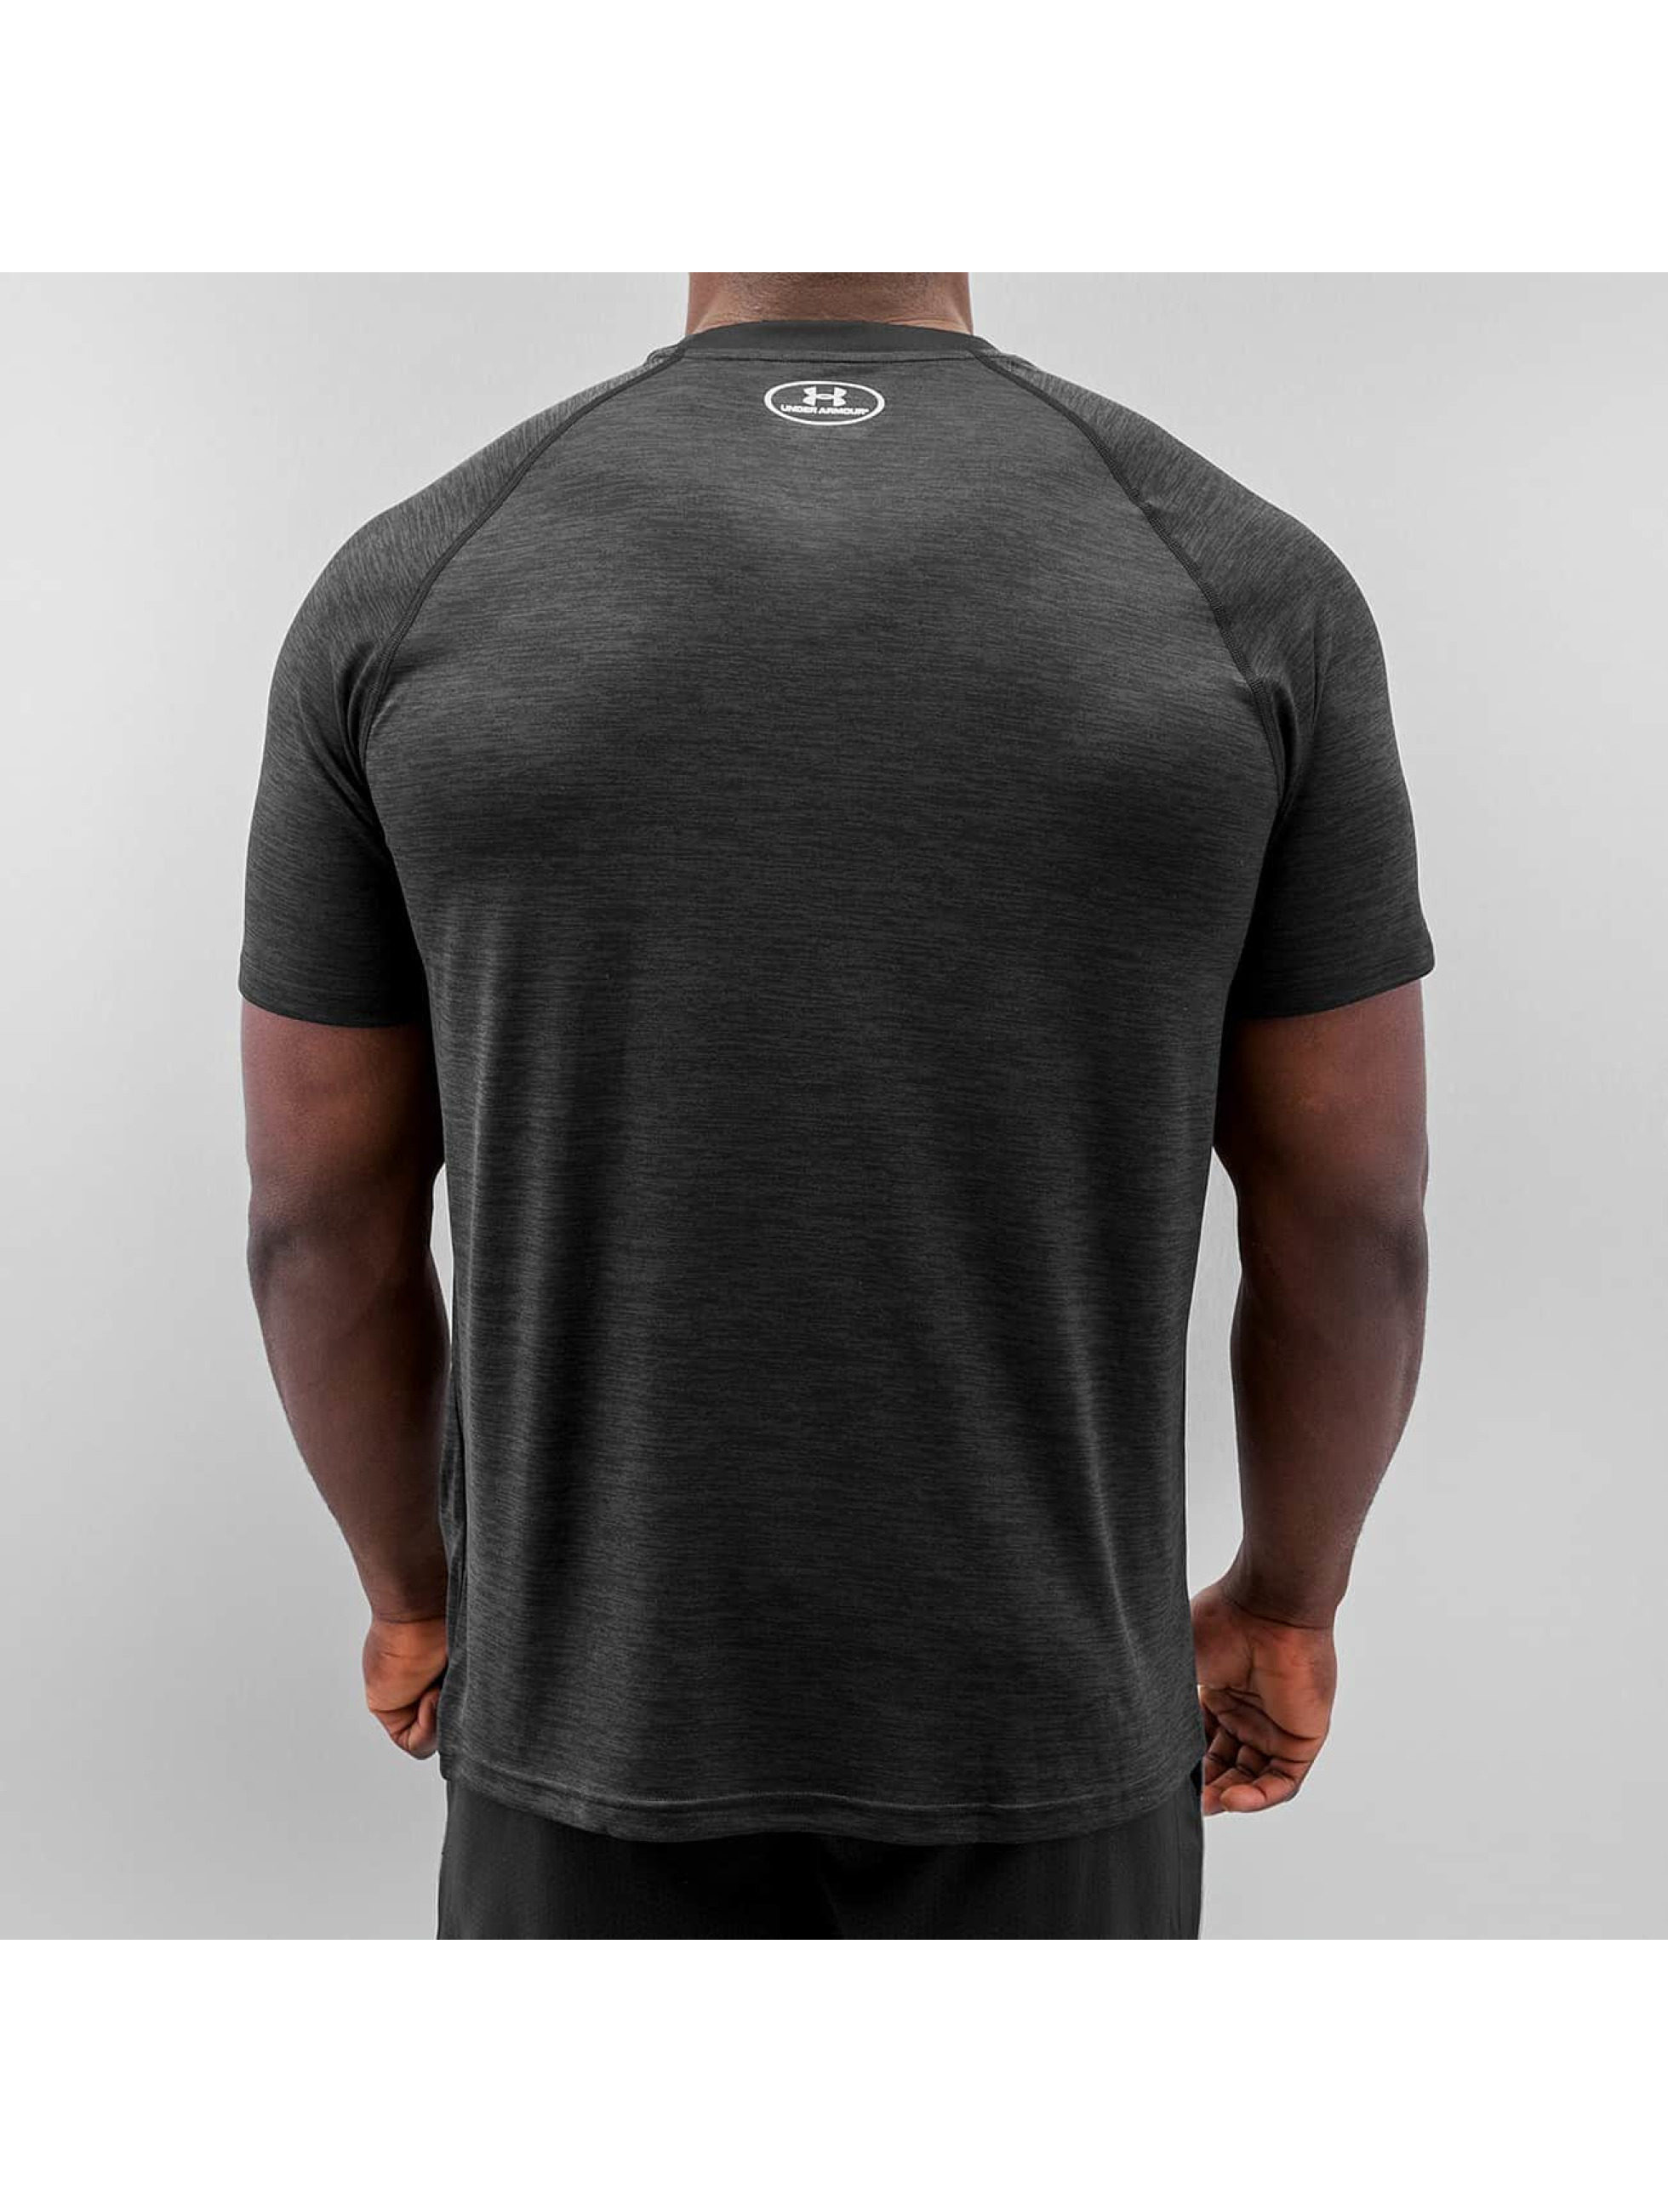 Under armour tech noir homme t shirt under armour for Original under armour shirt